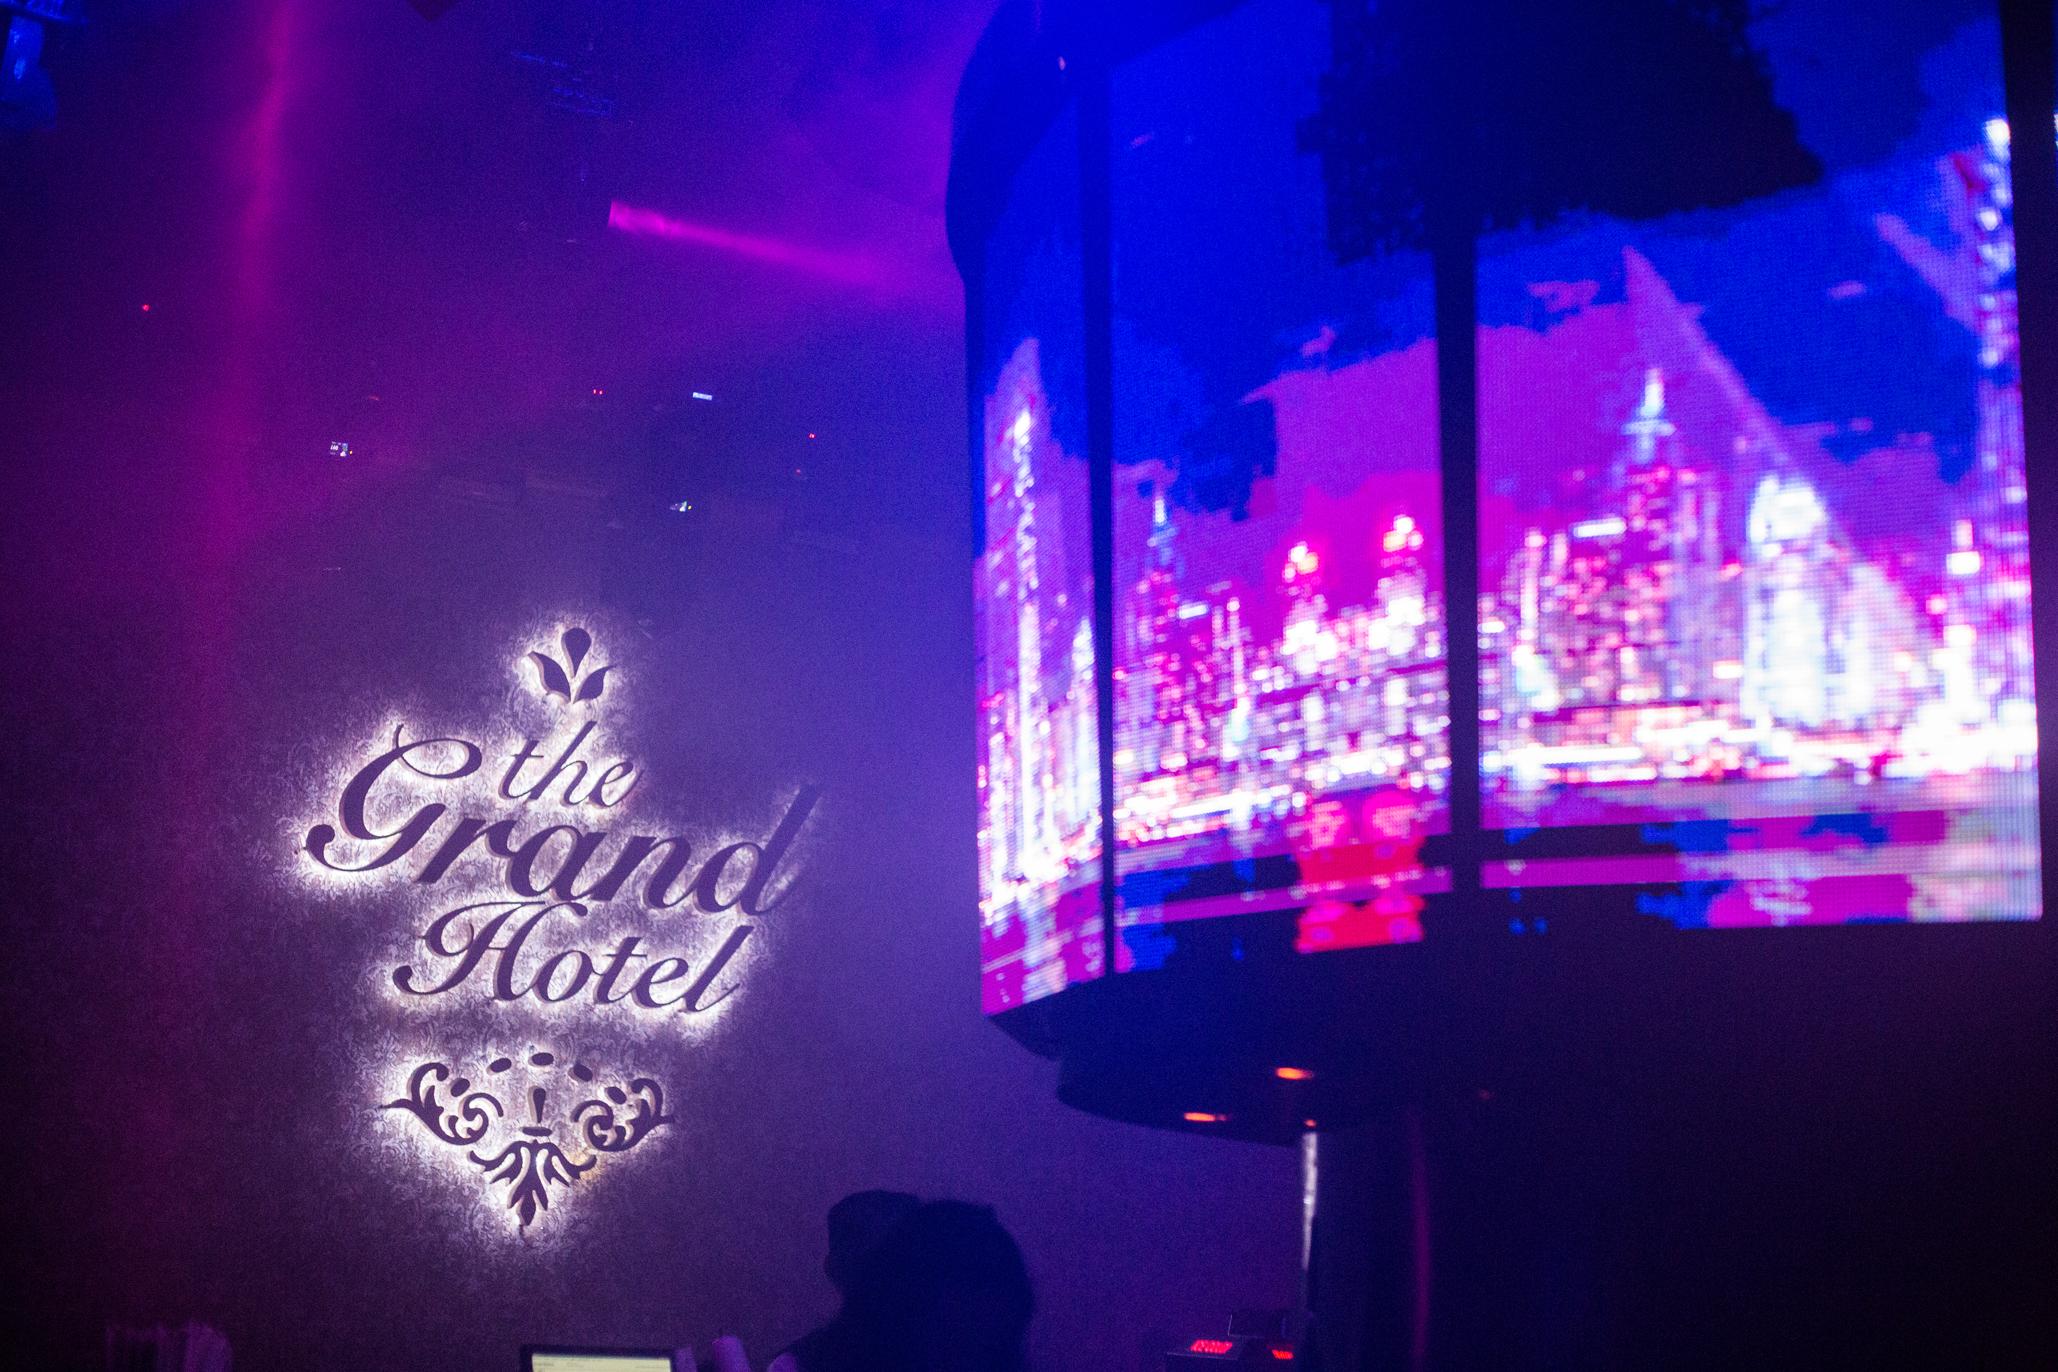 The Grand Hotel Club